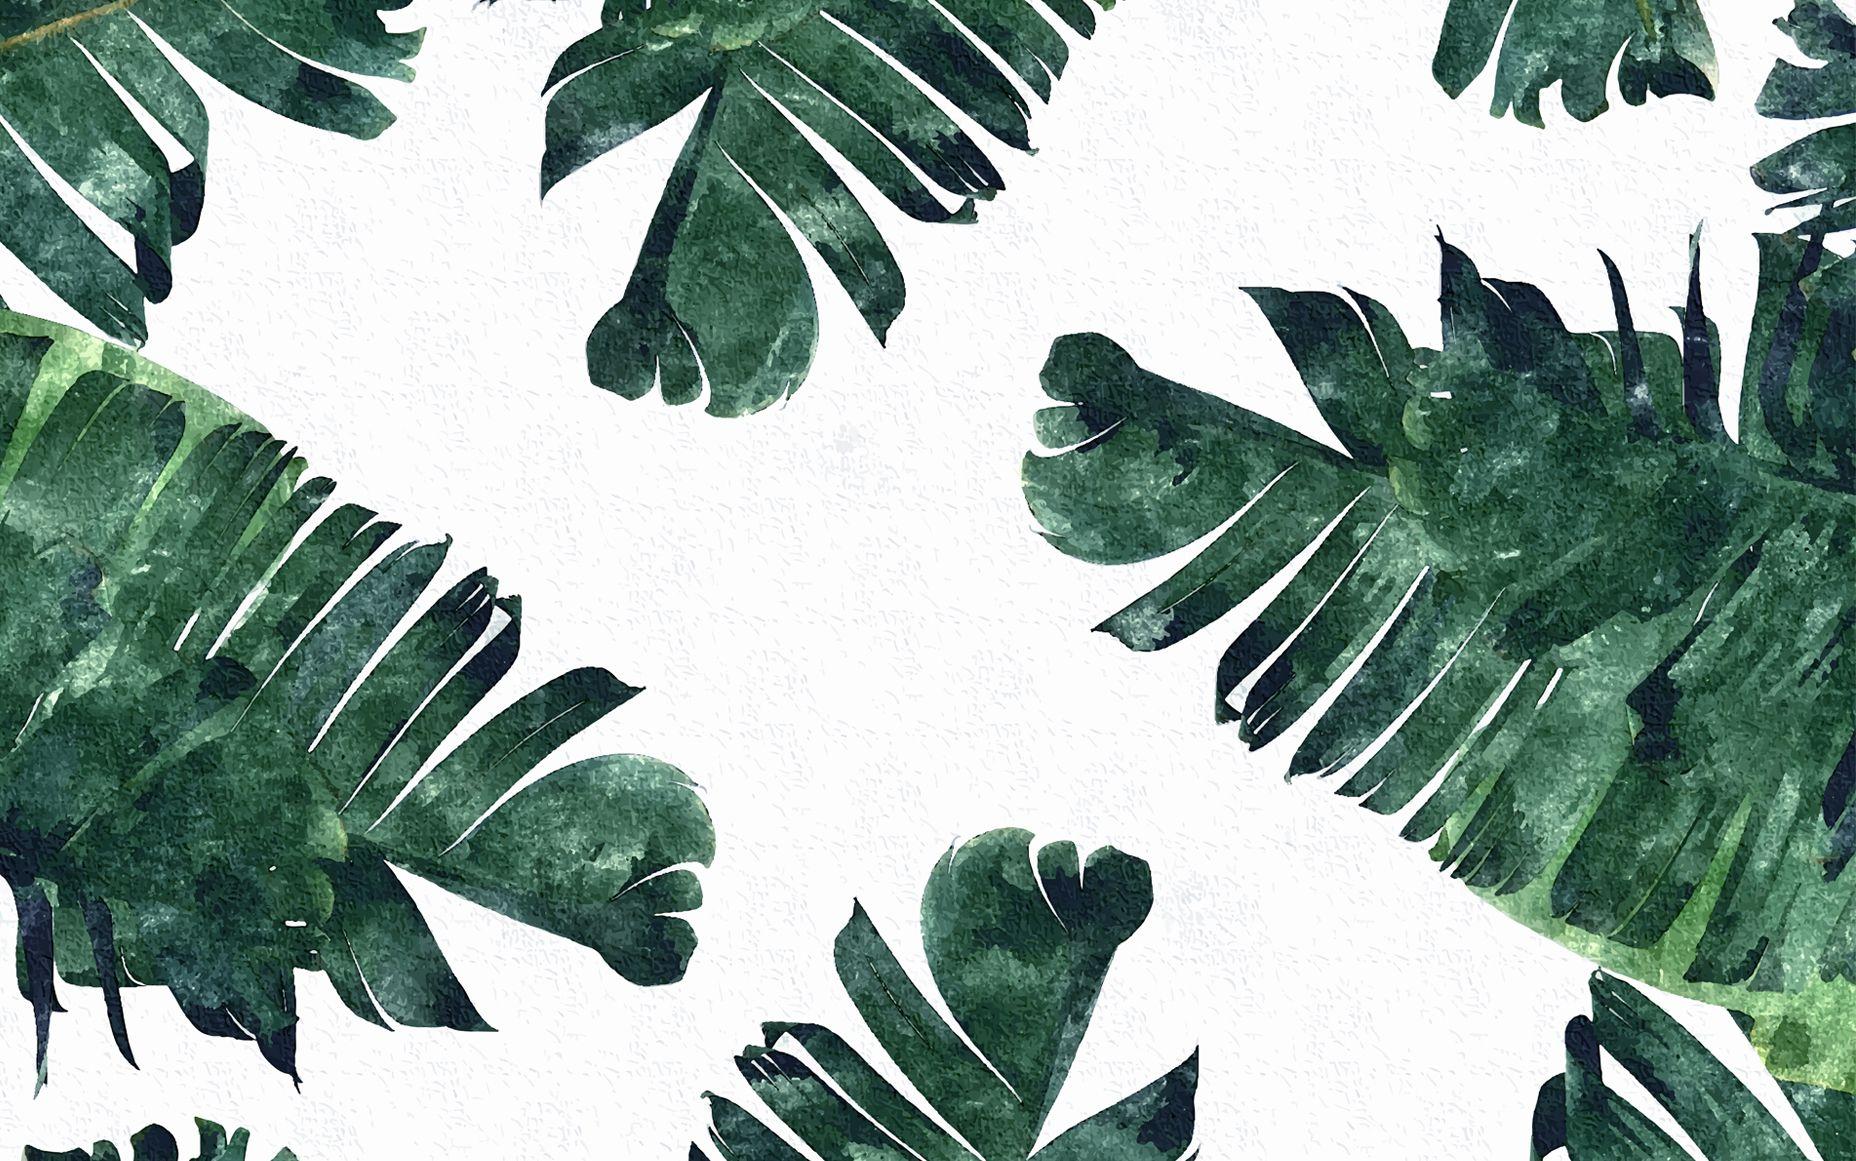 Banana-Leaf desktop wallpaper   p a t t e r n s   Pinterest ...